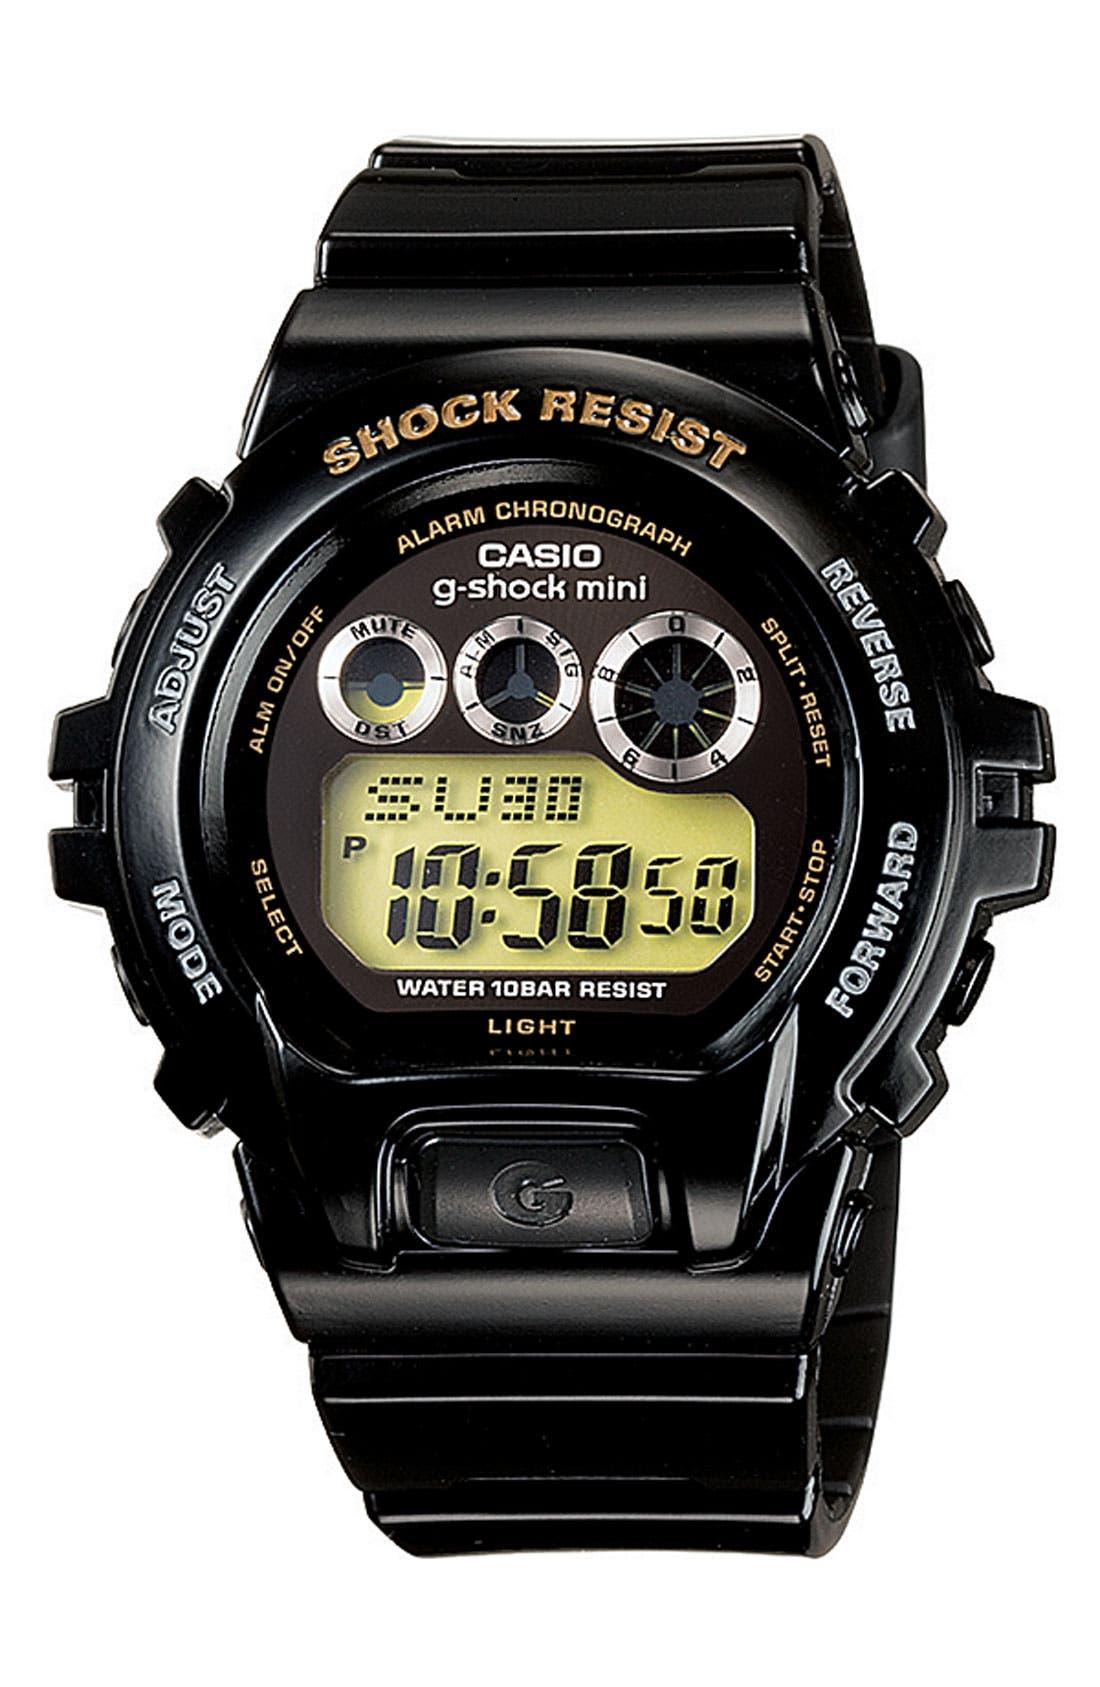 G-SHOCK BABY-G,                             Casio 'G-Shock Mini' Watch,                             Main thumbnail 1, color,                             001